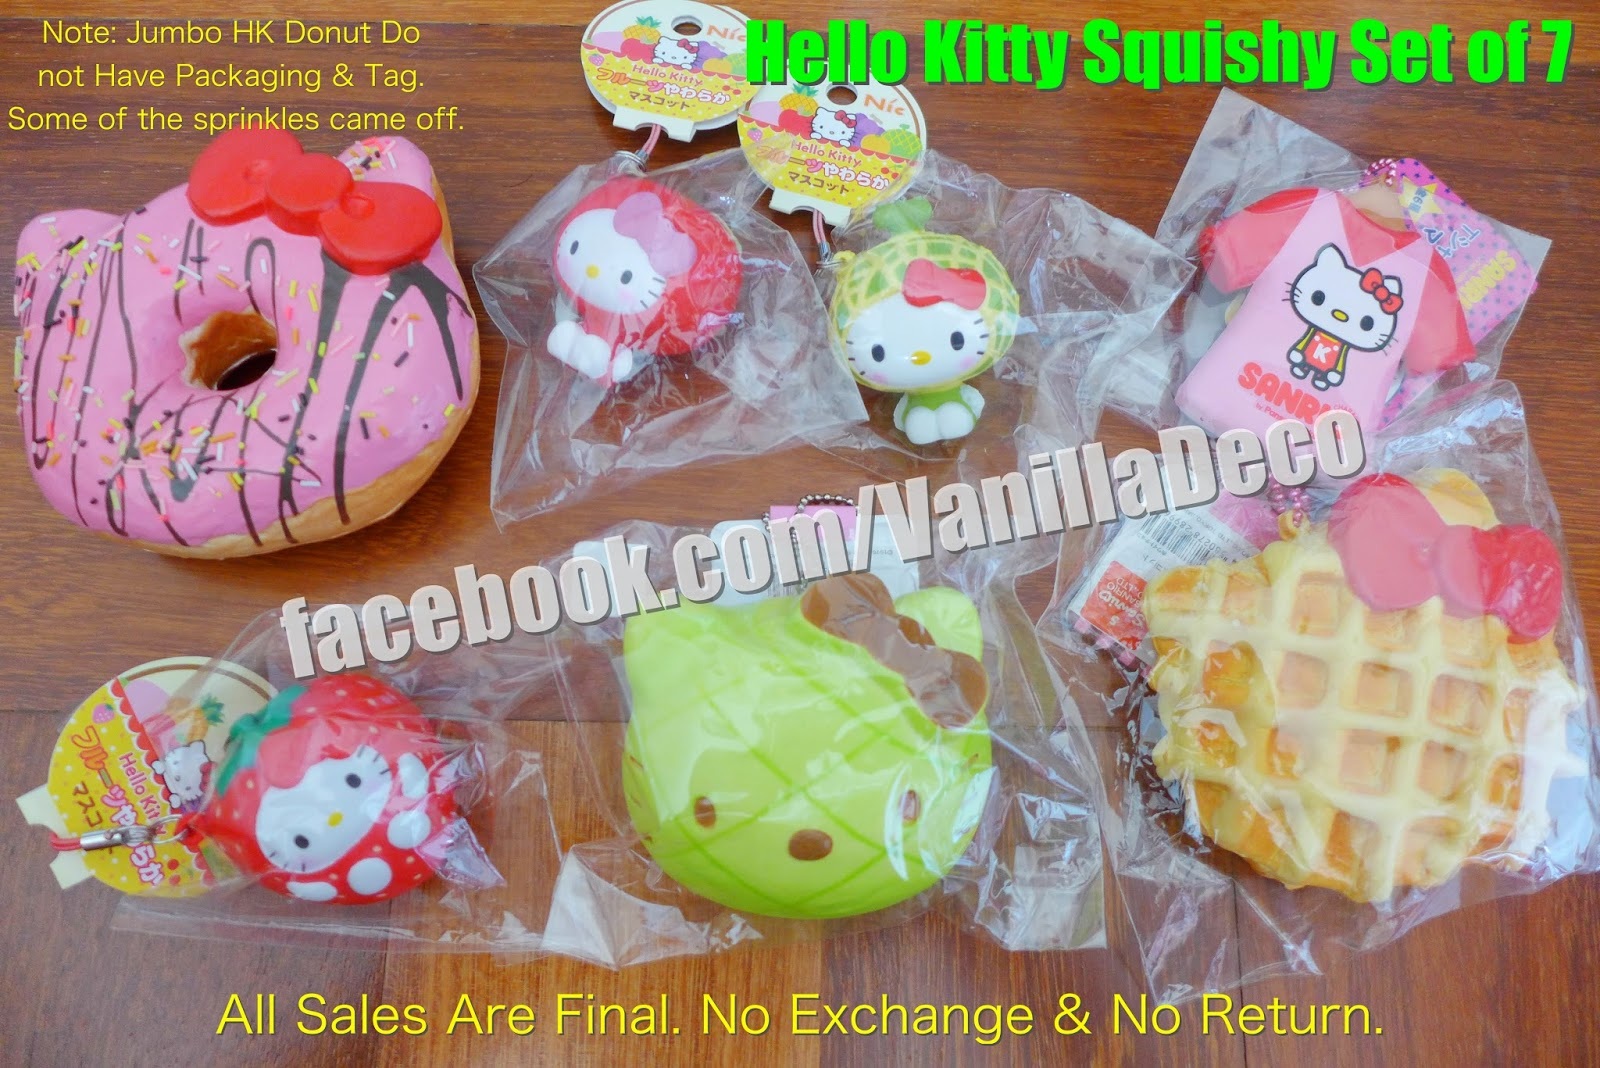 Rilakkuma Tag Squishy Supplier : Sue s Cutie Closet : Squishy Update: Hello Kitty Squishy Set, Frogstyle Squishy Set, Moni Moni ...